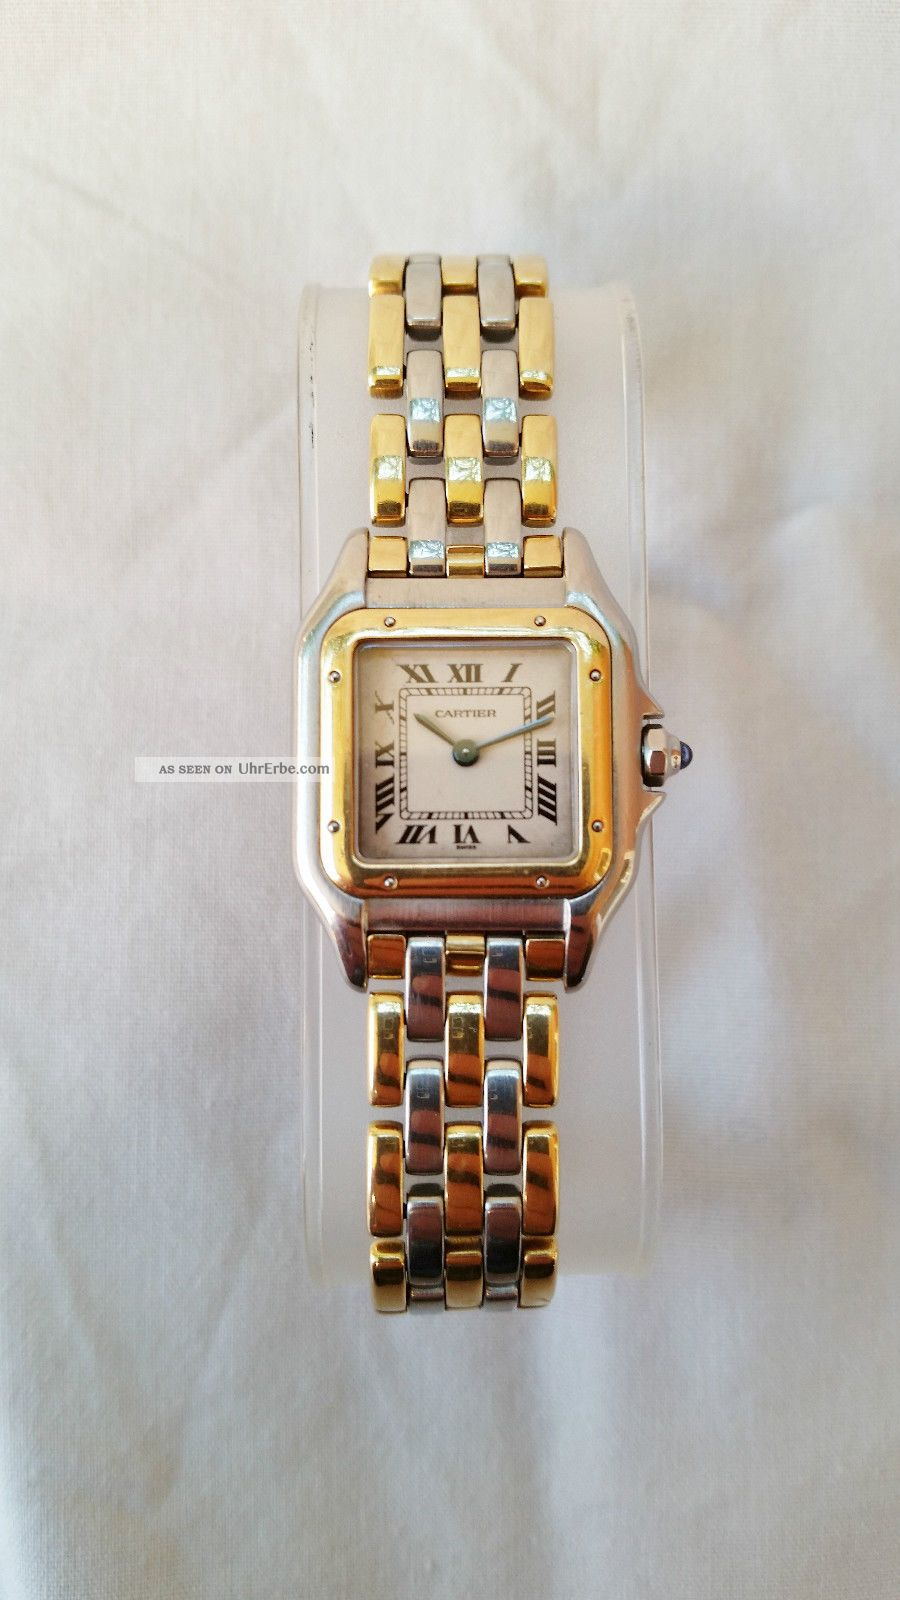 Cartier Santos Edelstahl/ - 750er Gelbgold 3 Reihen Gold Quartz Ca.  1990er Jahre Armbanduhren Bild